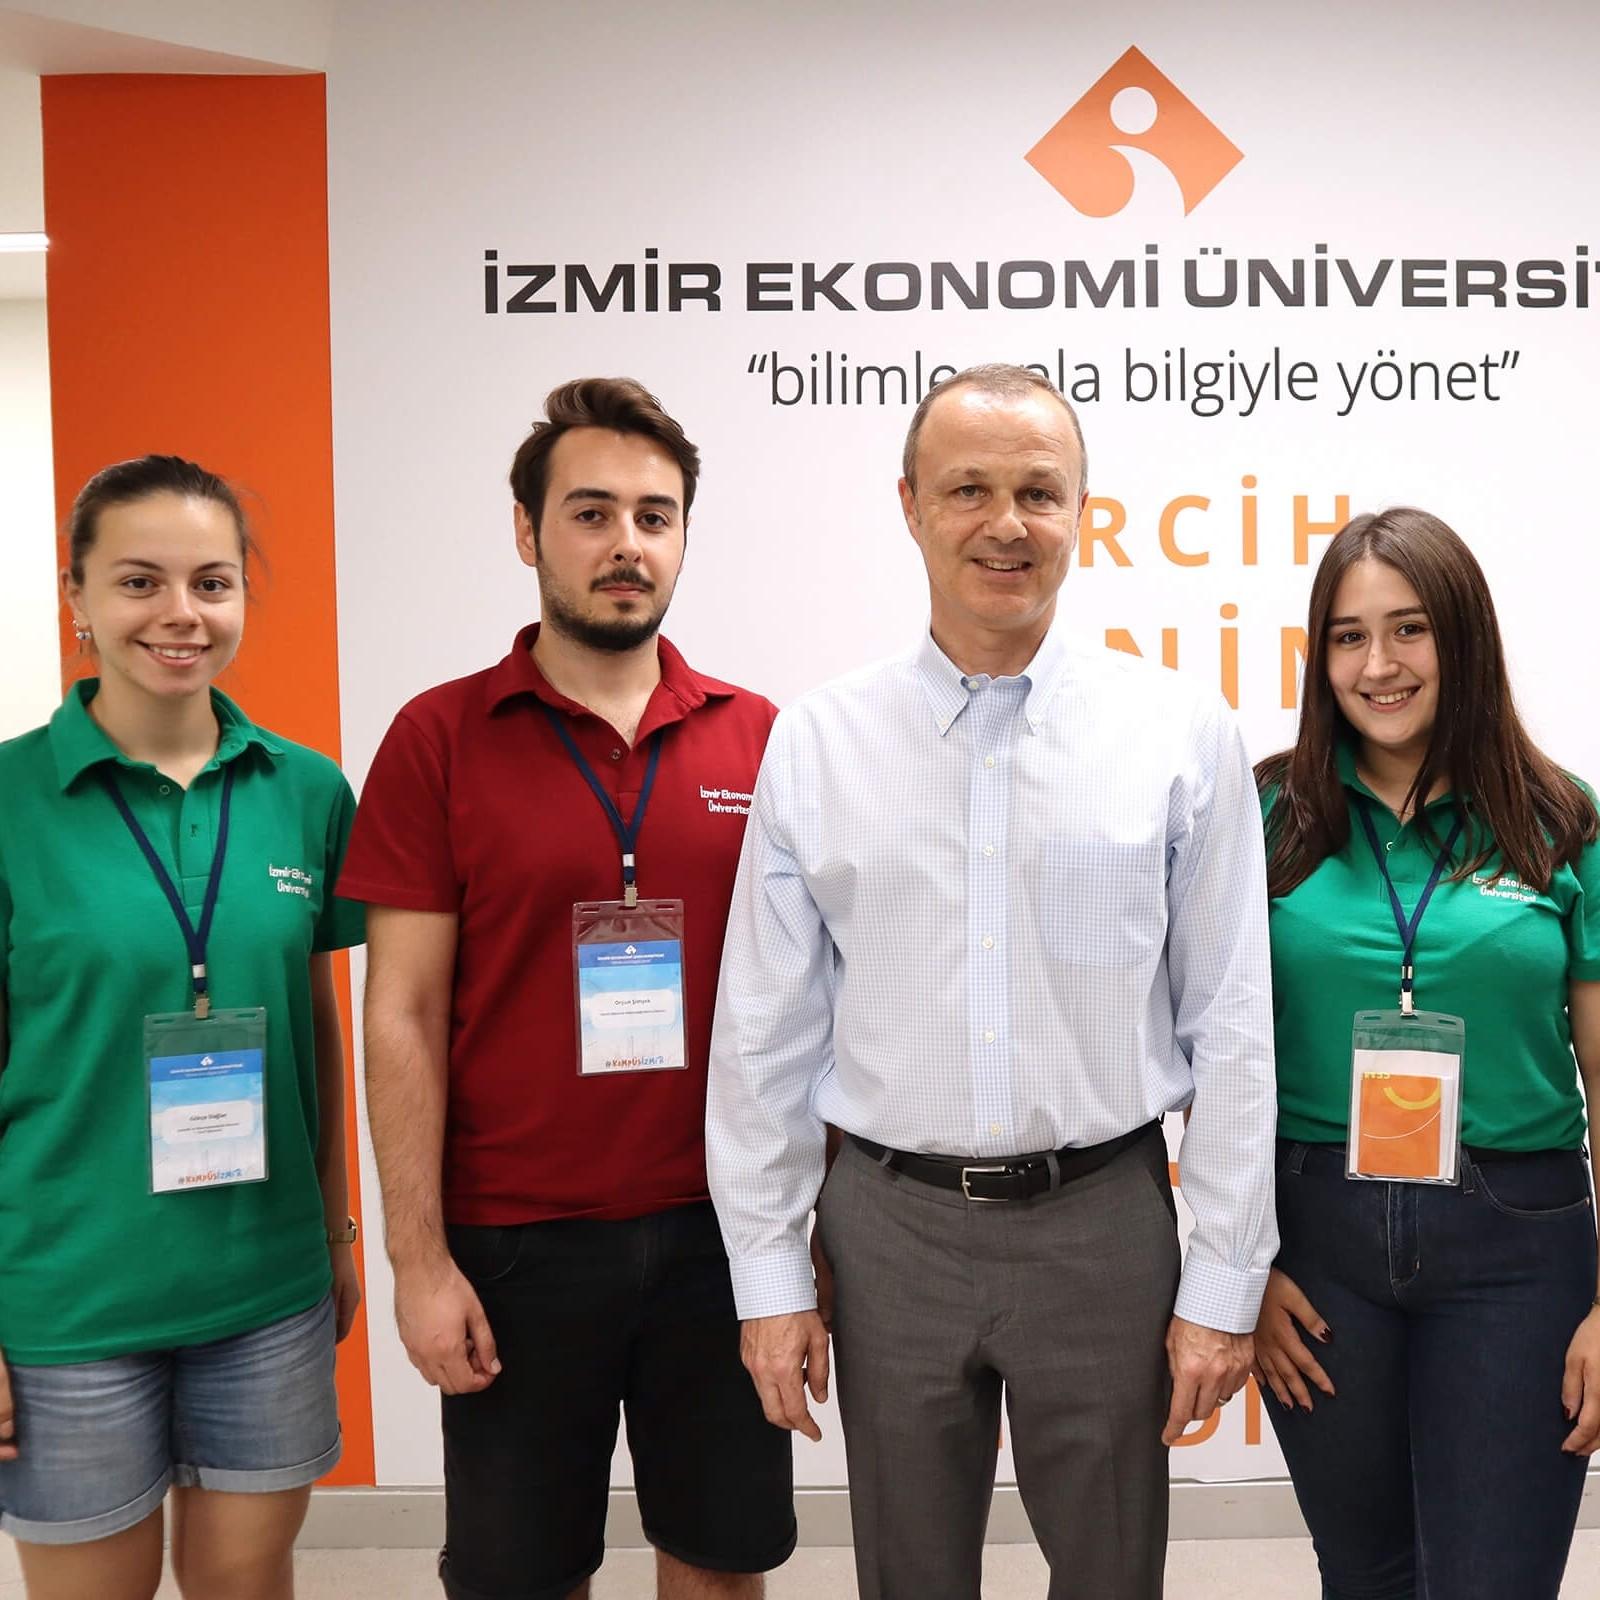 A great interest to Campus Izmir